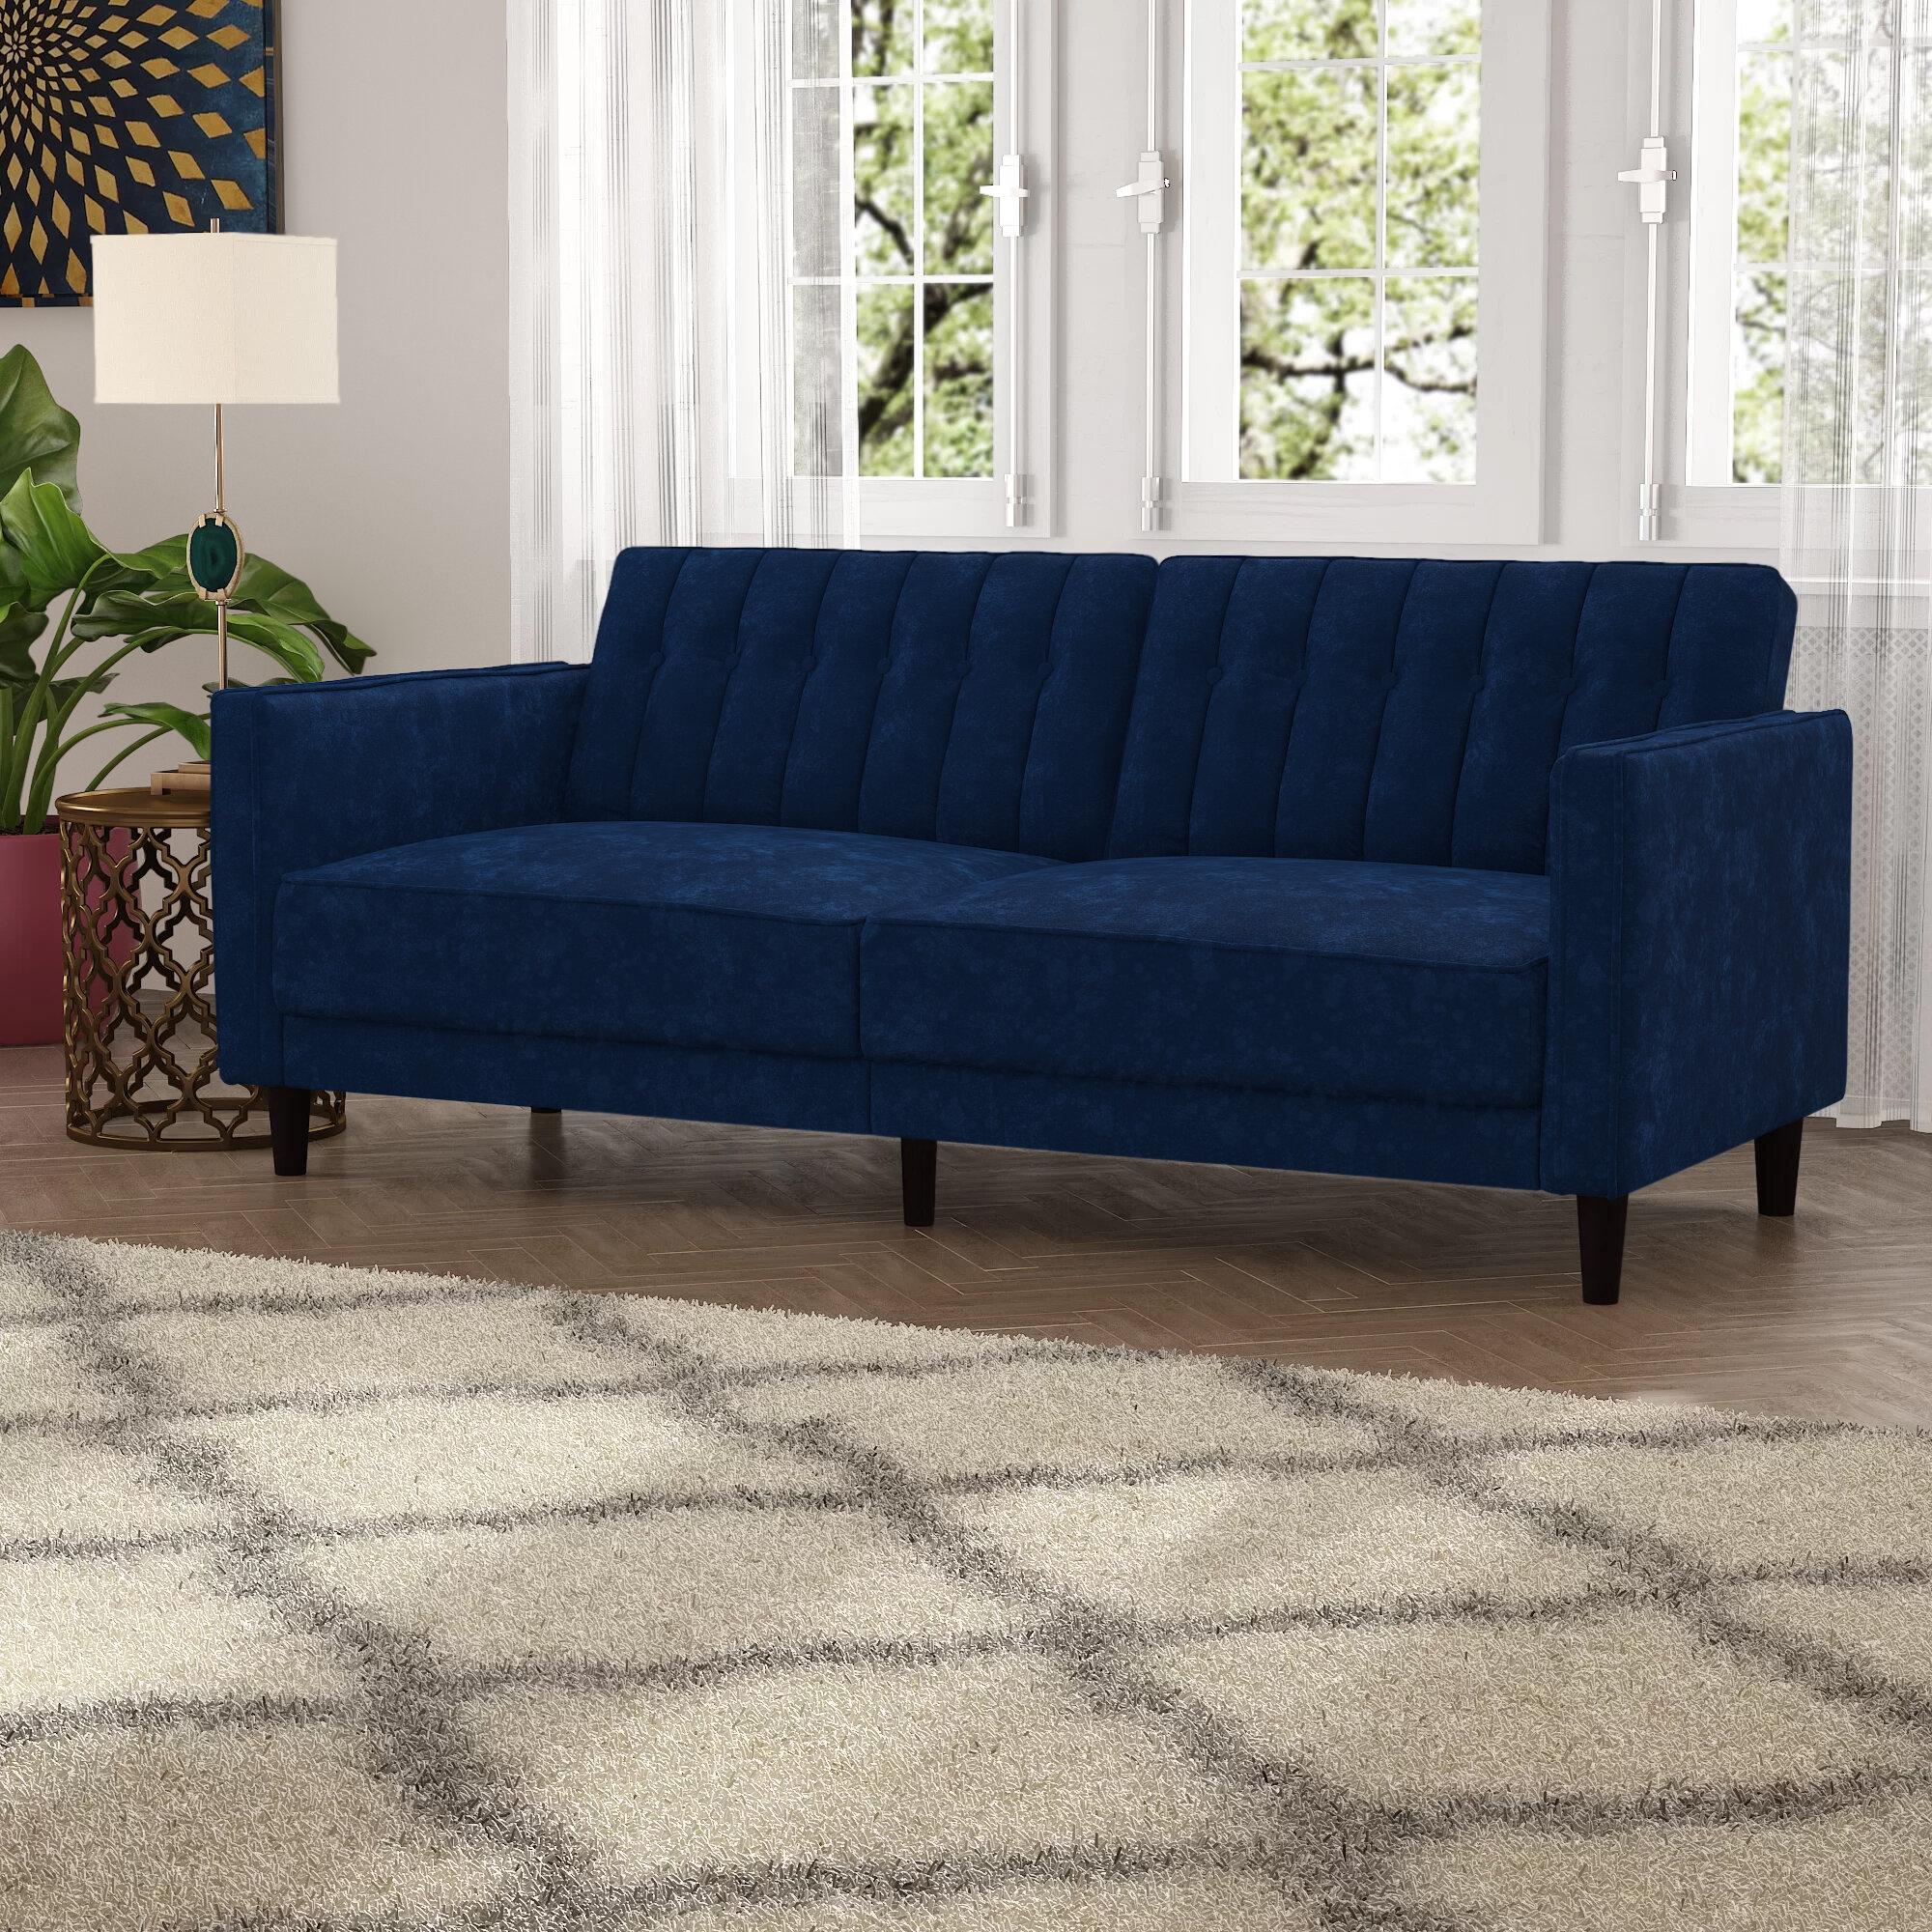 Mercer41 Grattan 81 1 Square Arm Sofa